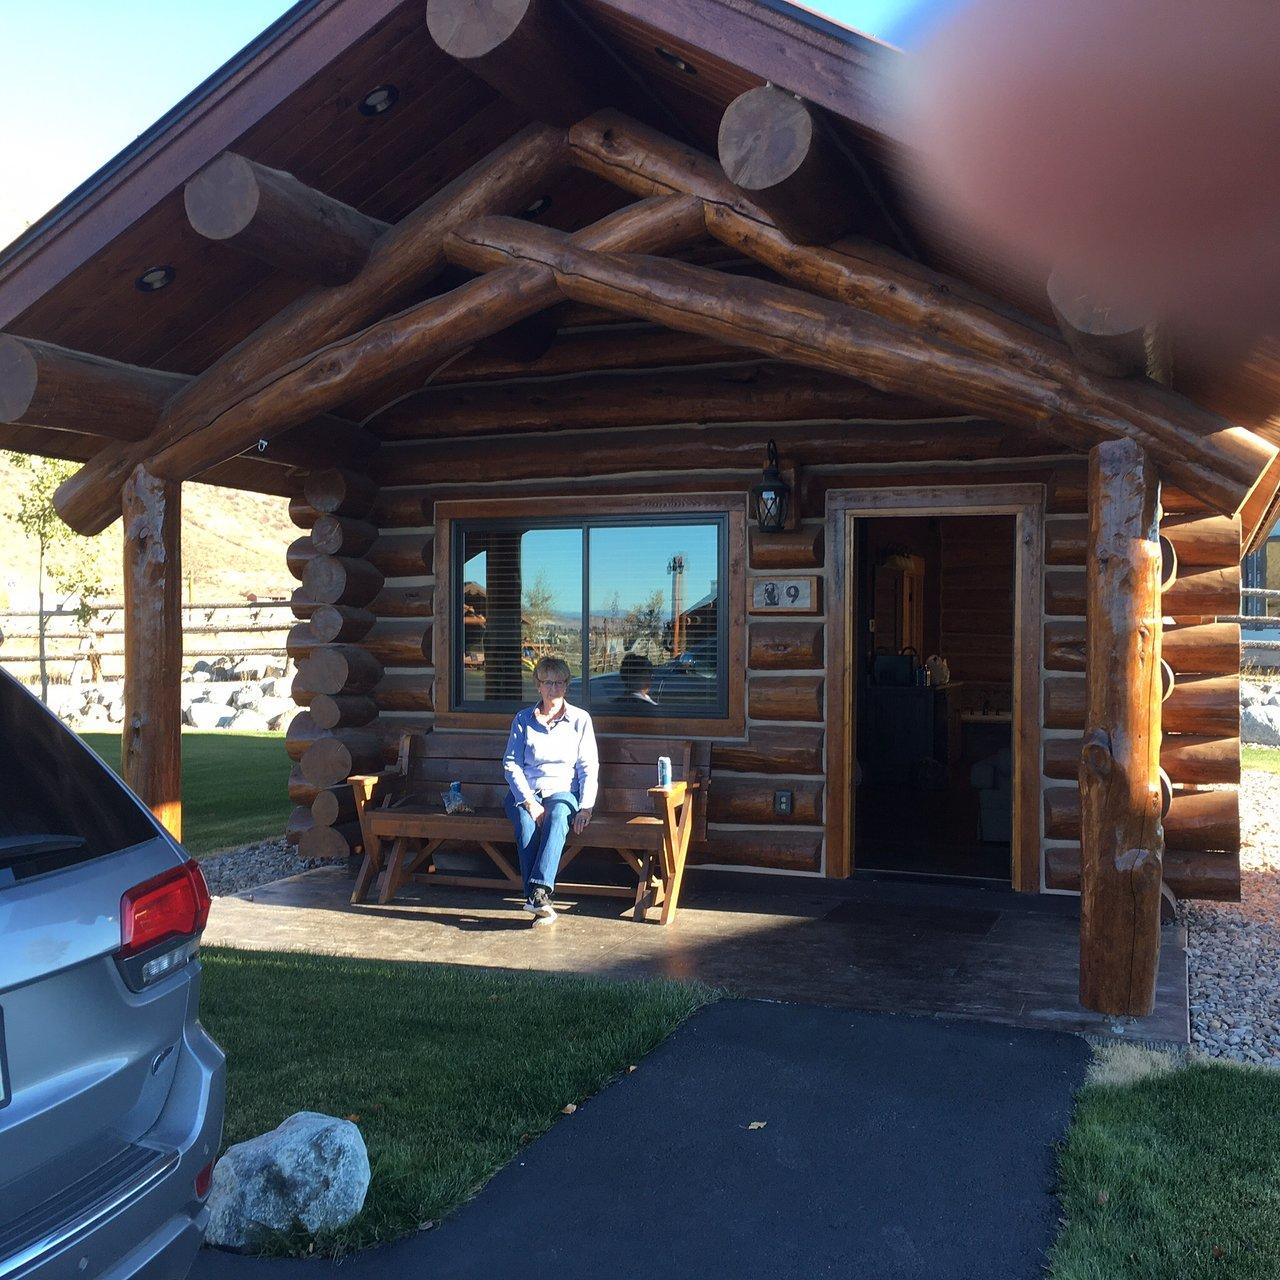 kodiak mountain resort $117 ($̶1̶2̶5̶) - updated 2019 prices